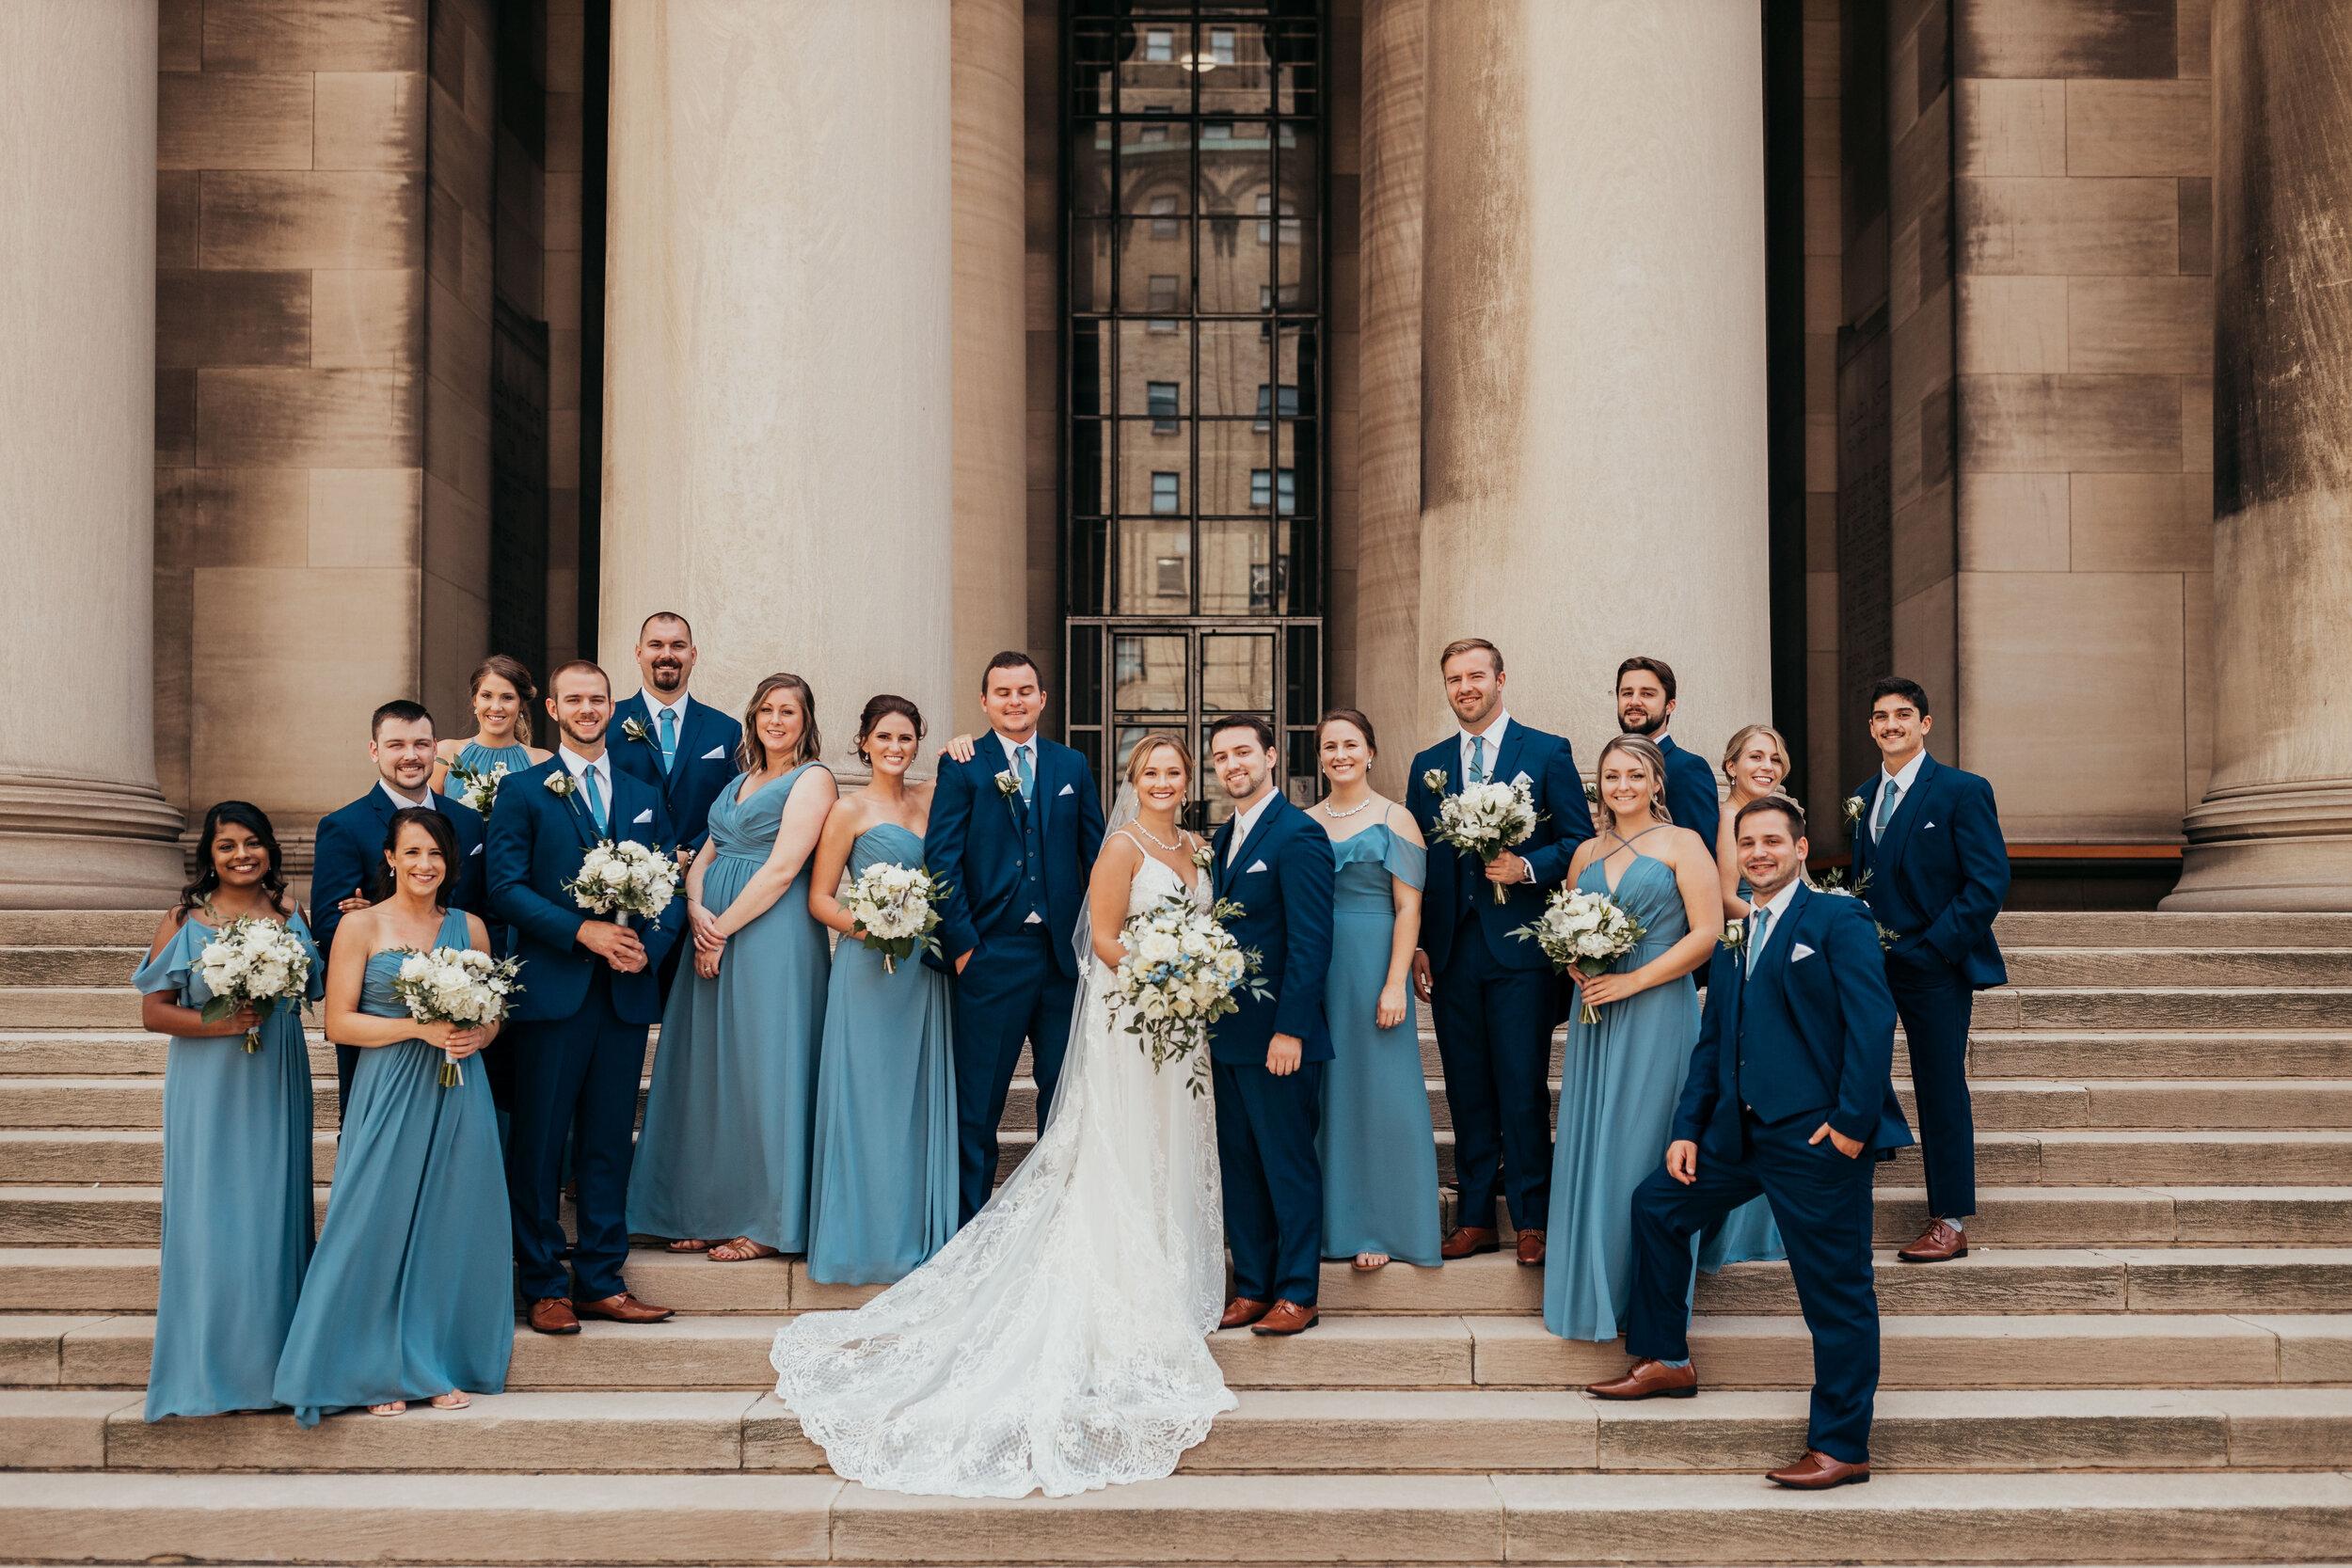 Pittsburgh wedding photography - Hartwood Acres Mansion wedding-332.jpg